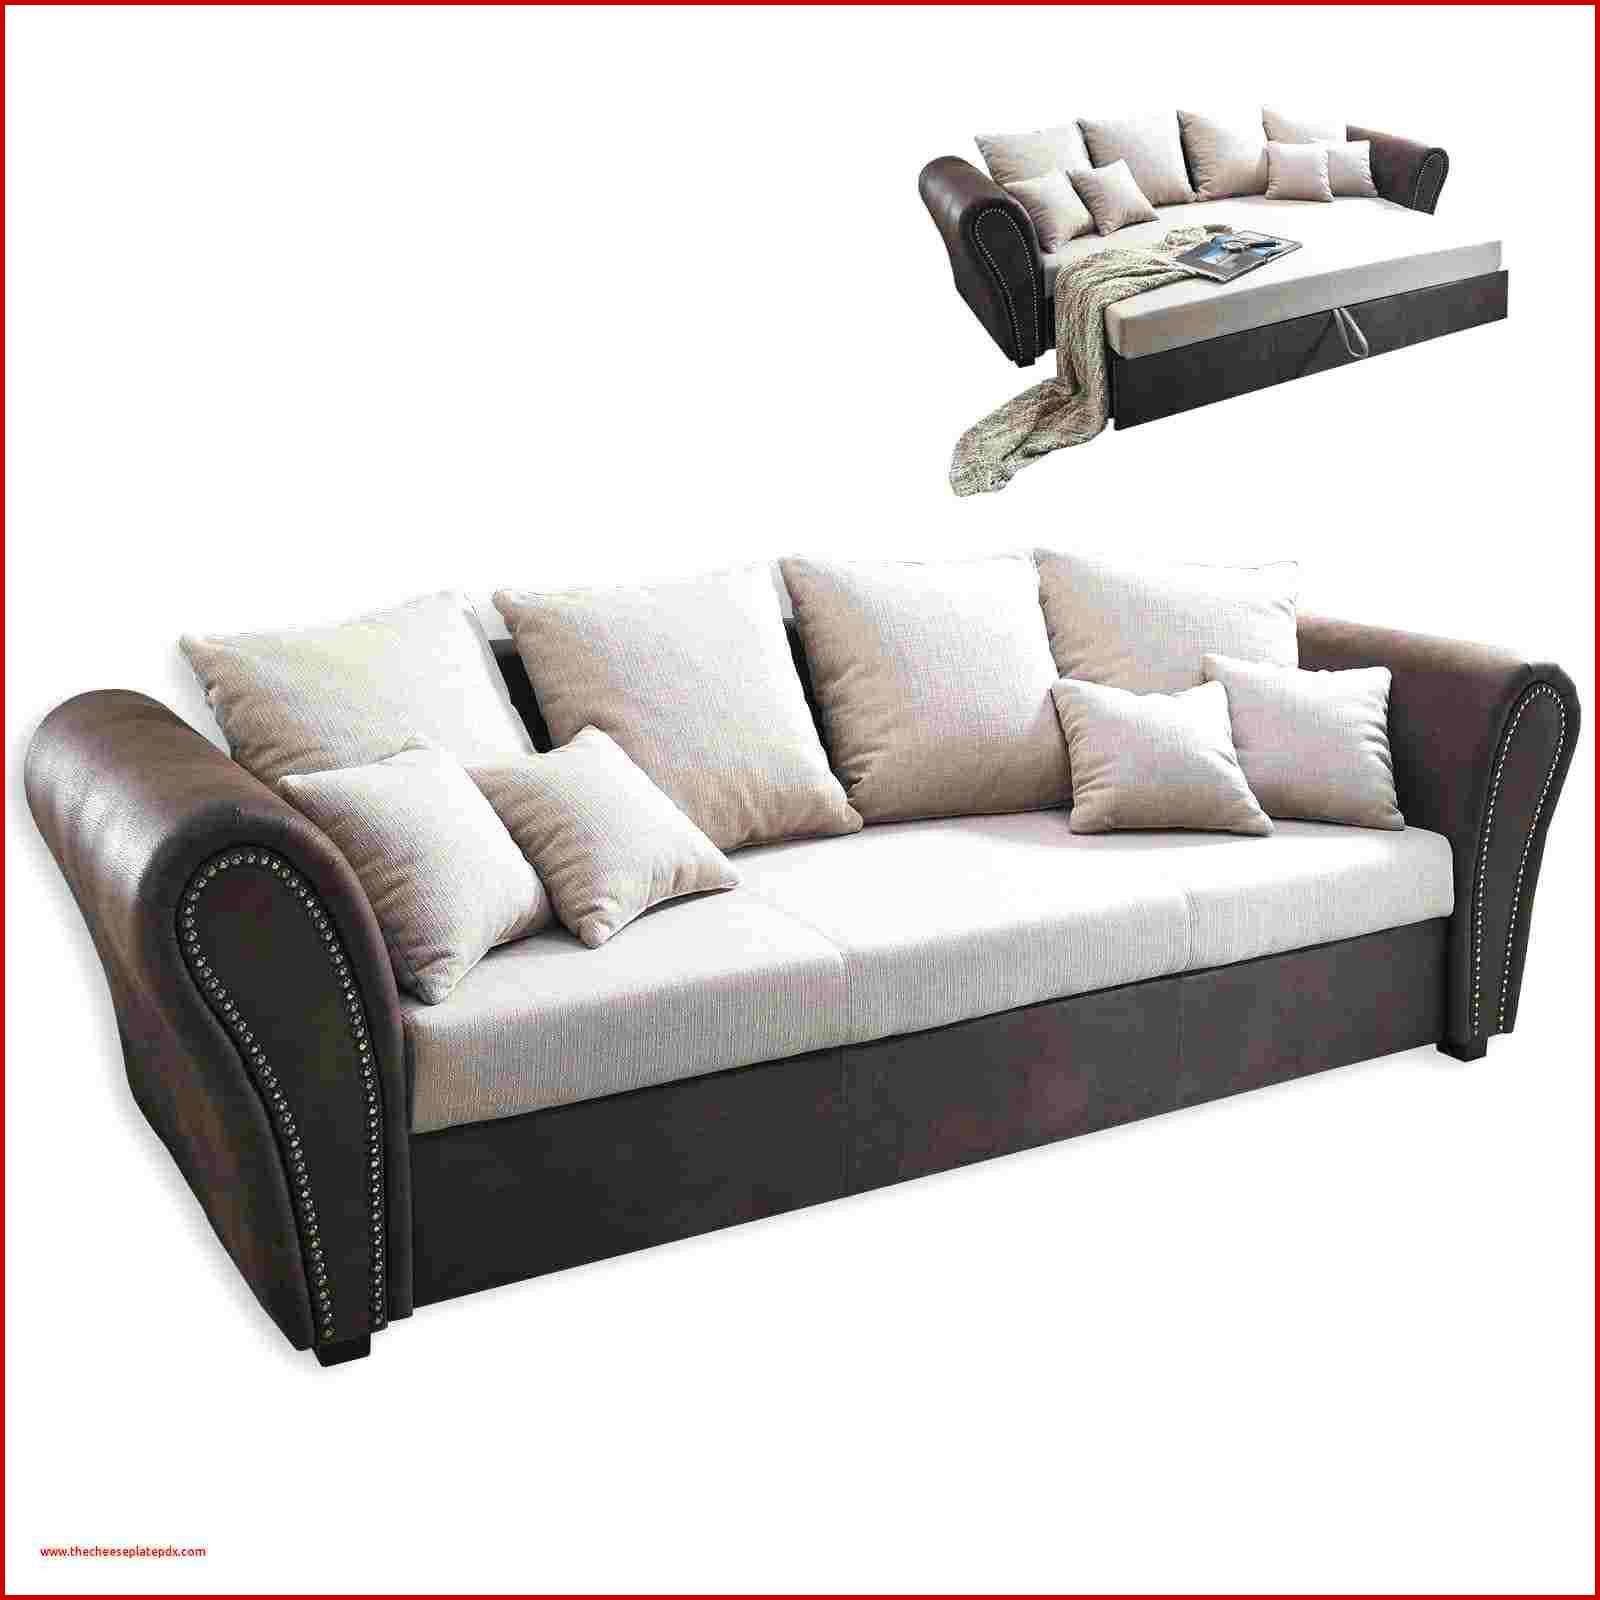 wohnlandschaft weis braun big sofa xxl lutz wohnlandschaft weis braun 1